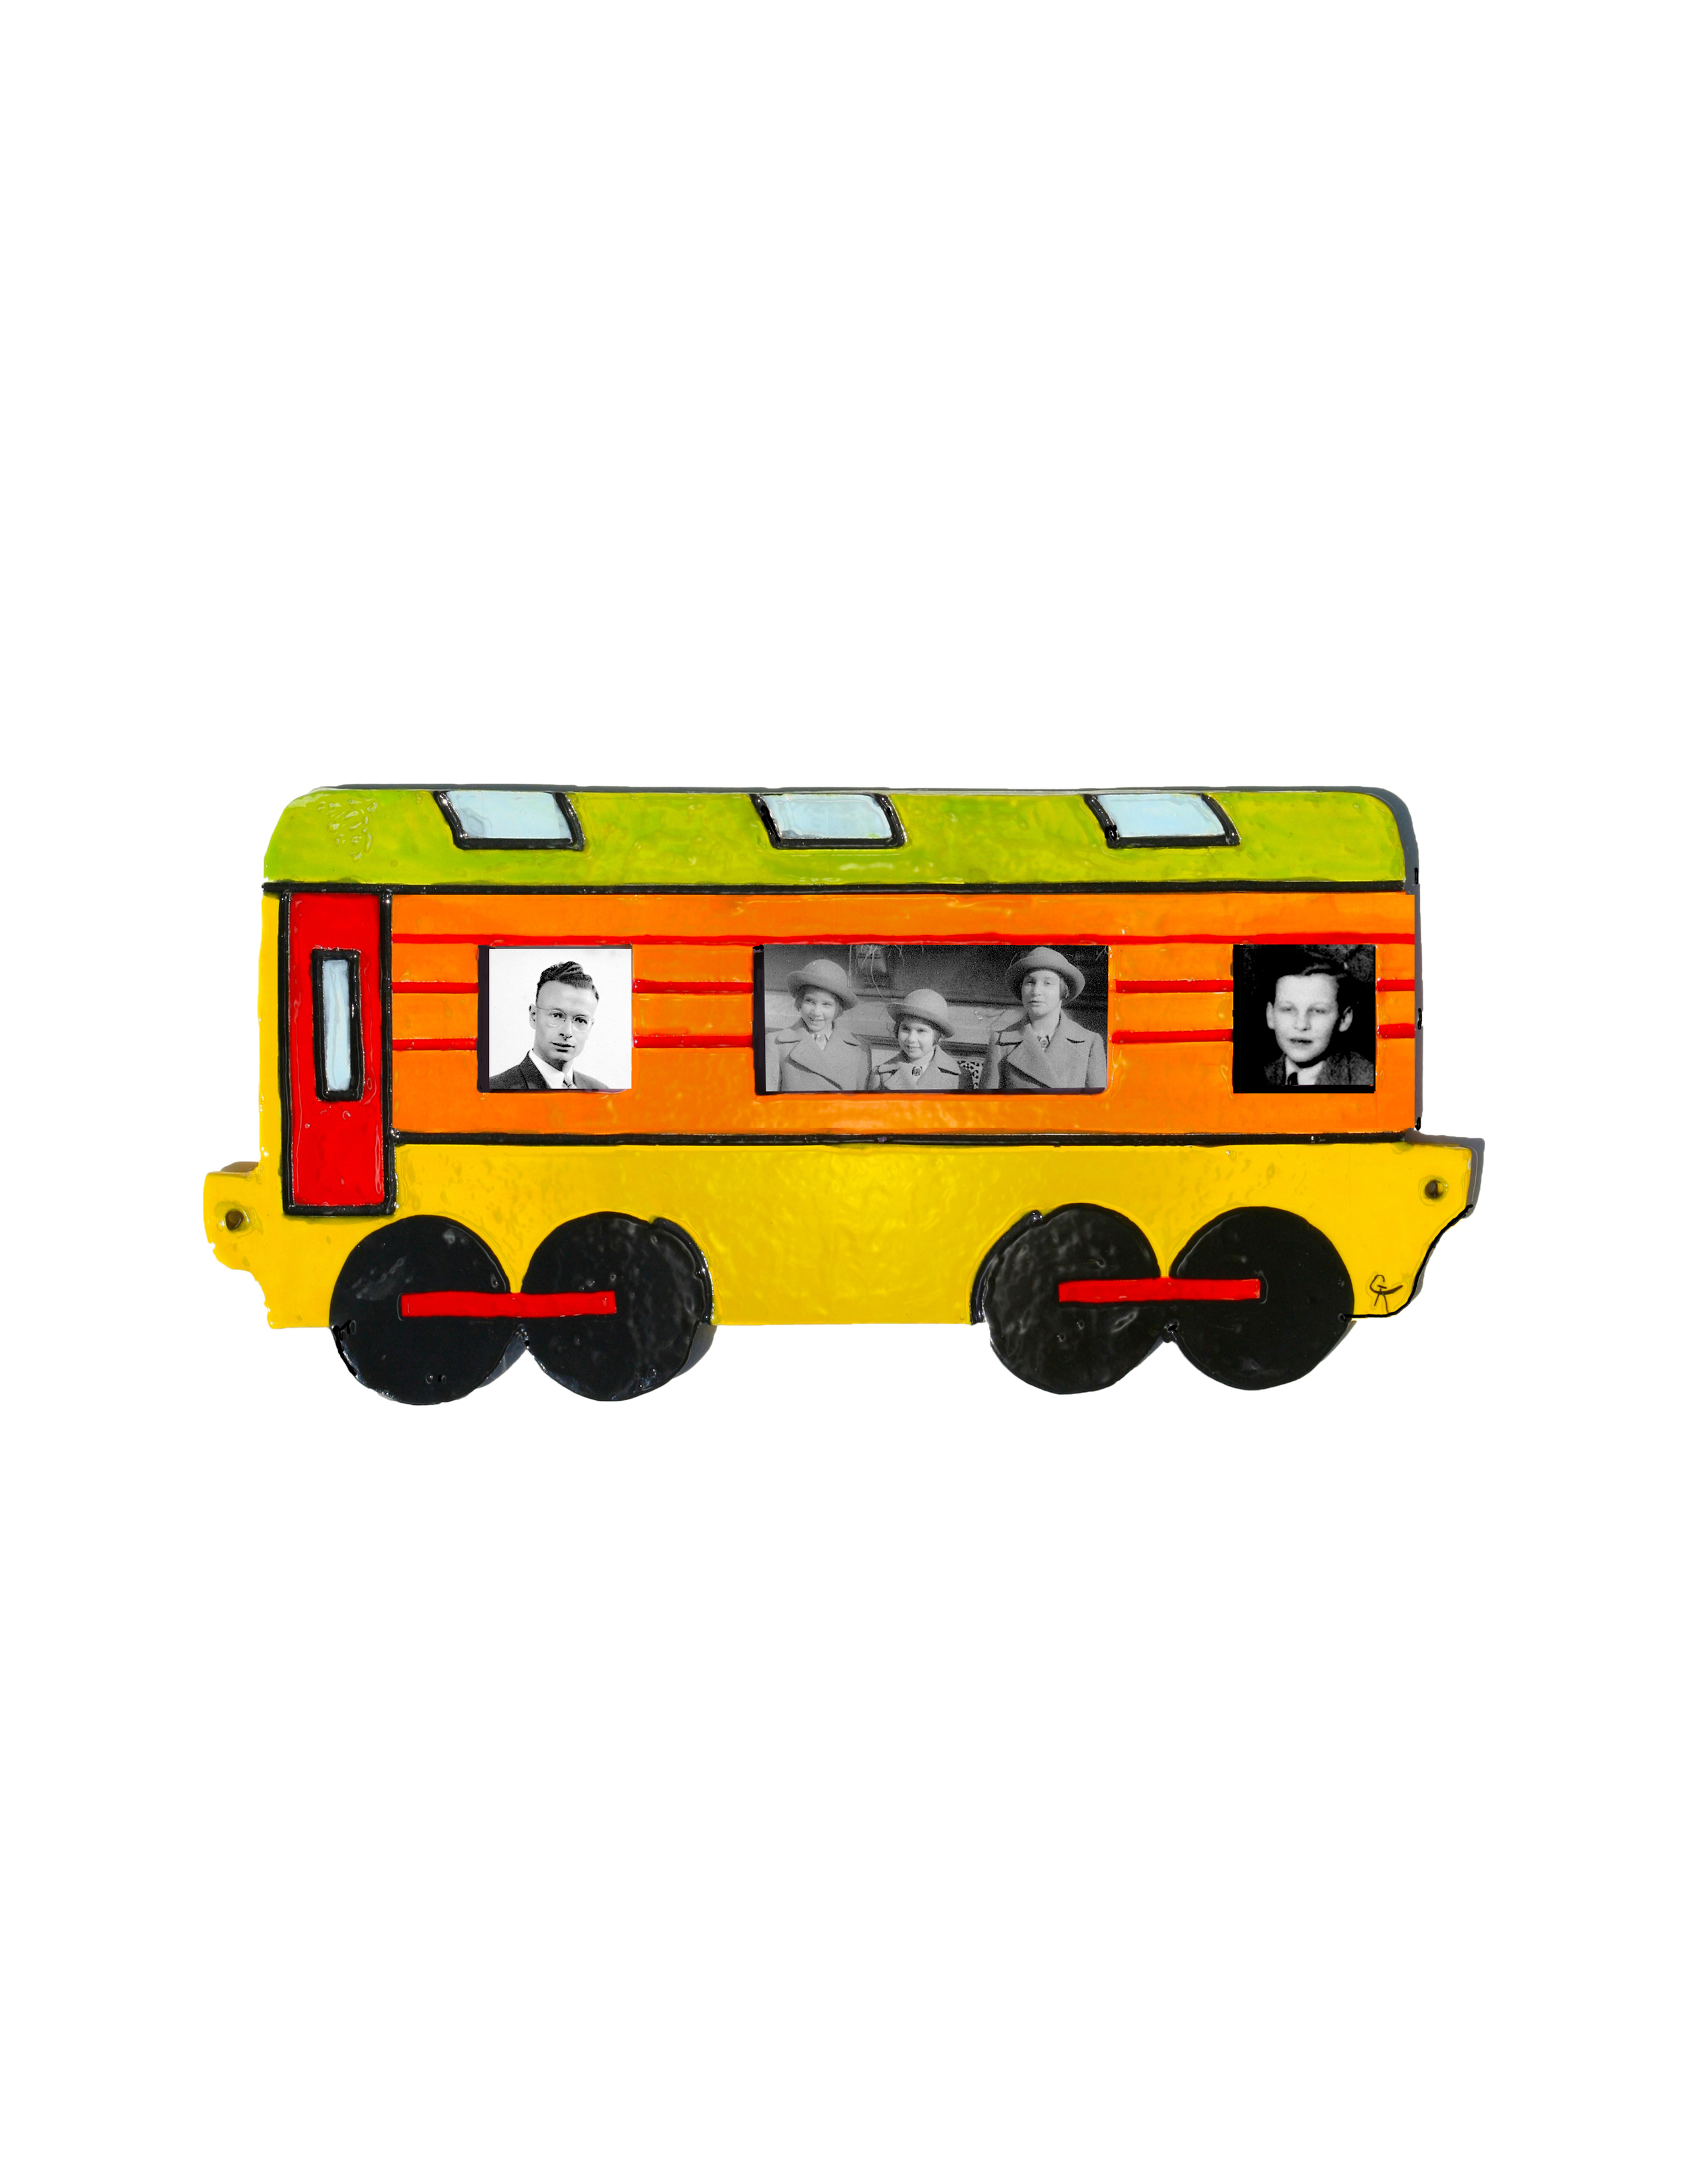 Train 46.jpg